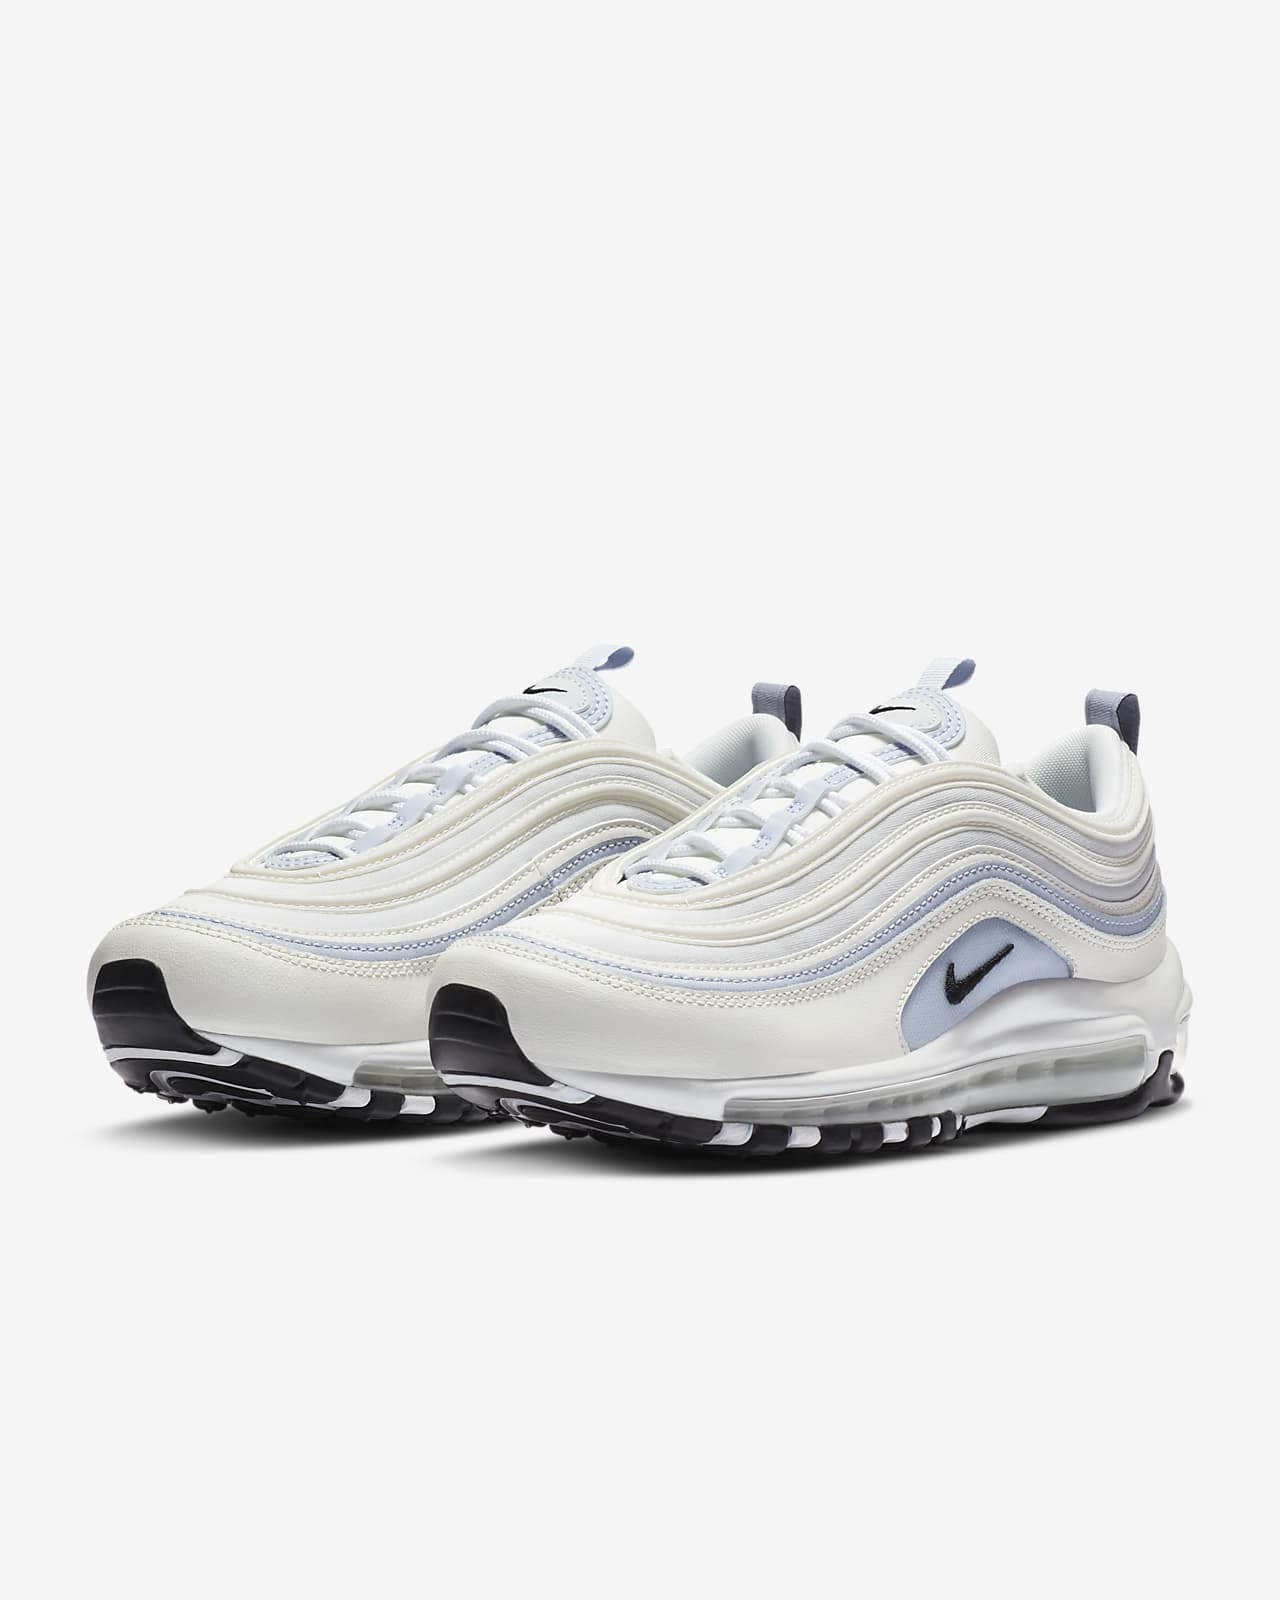 Nike Air Max 97 Essential Women's Shoes